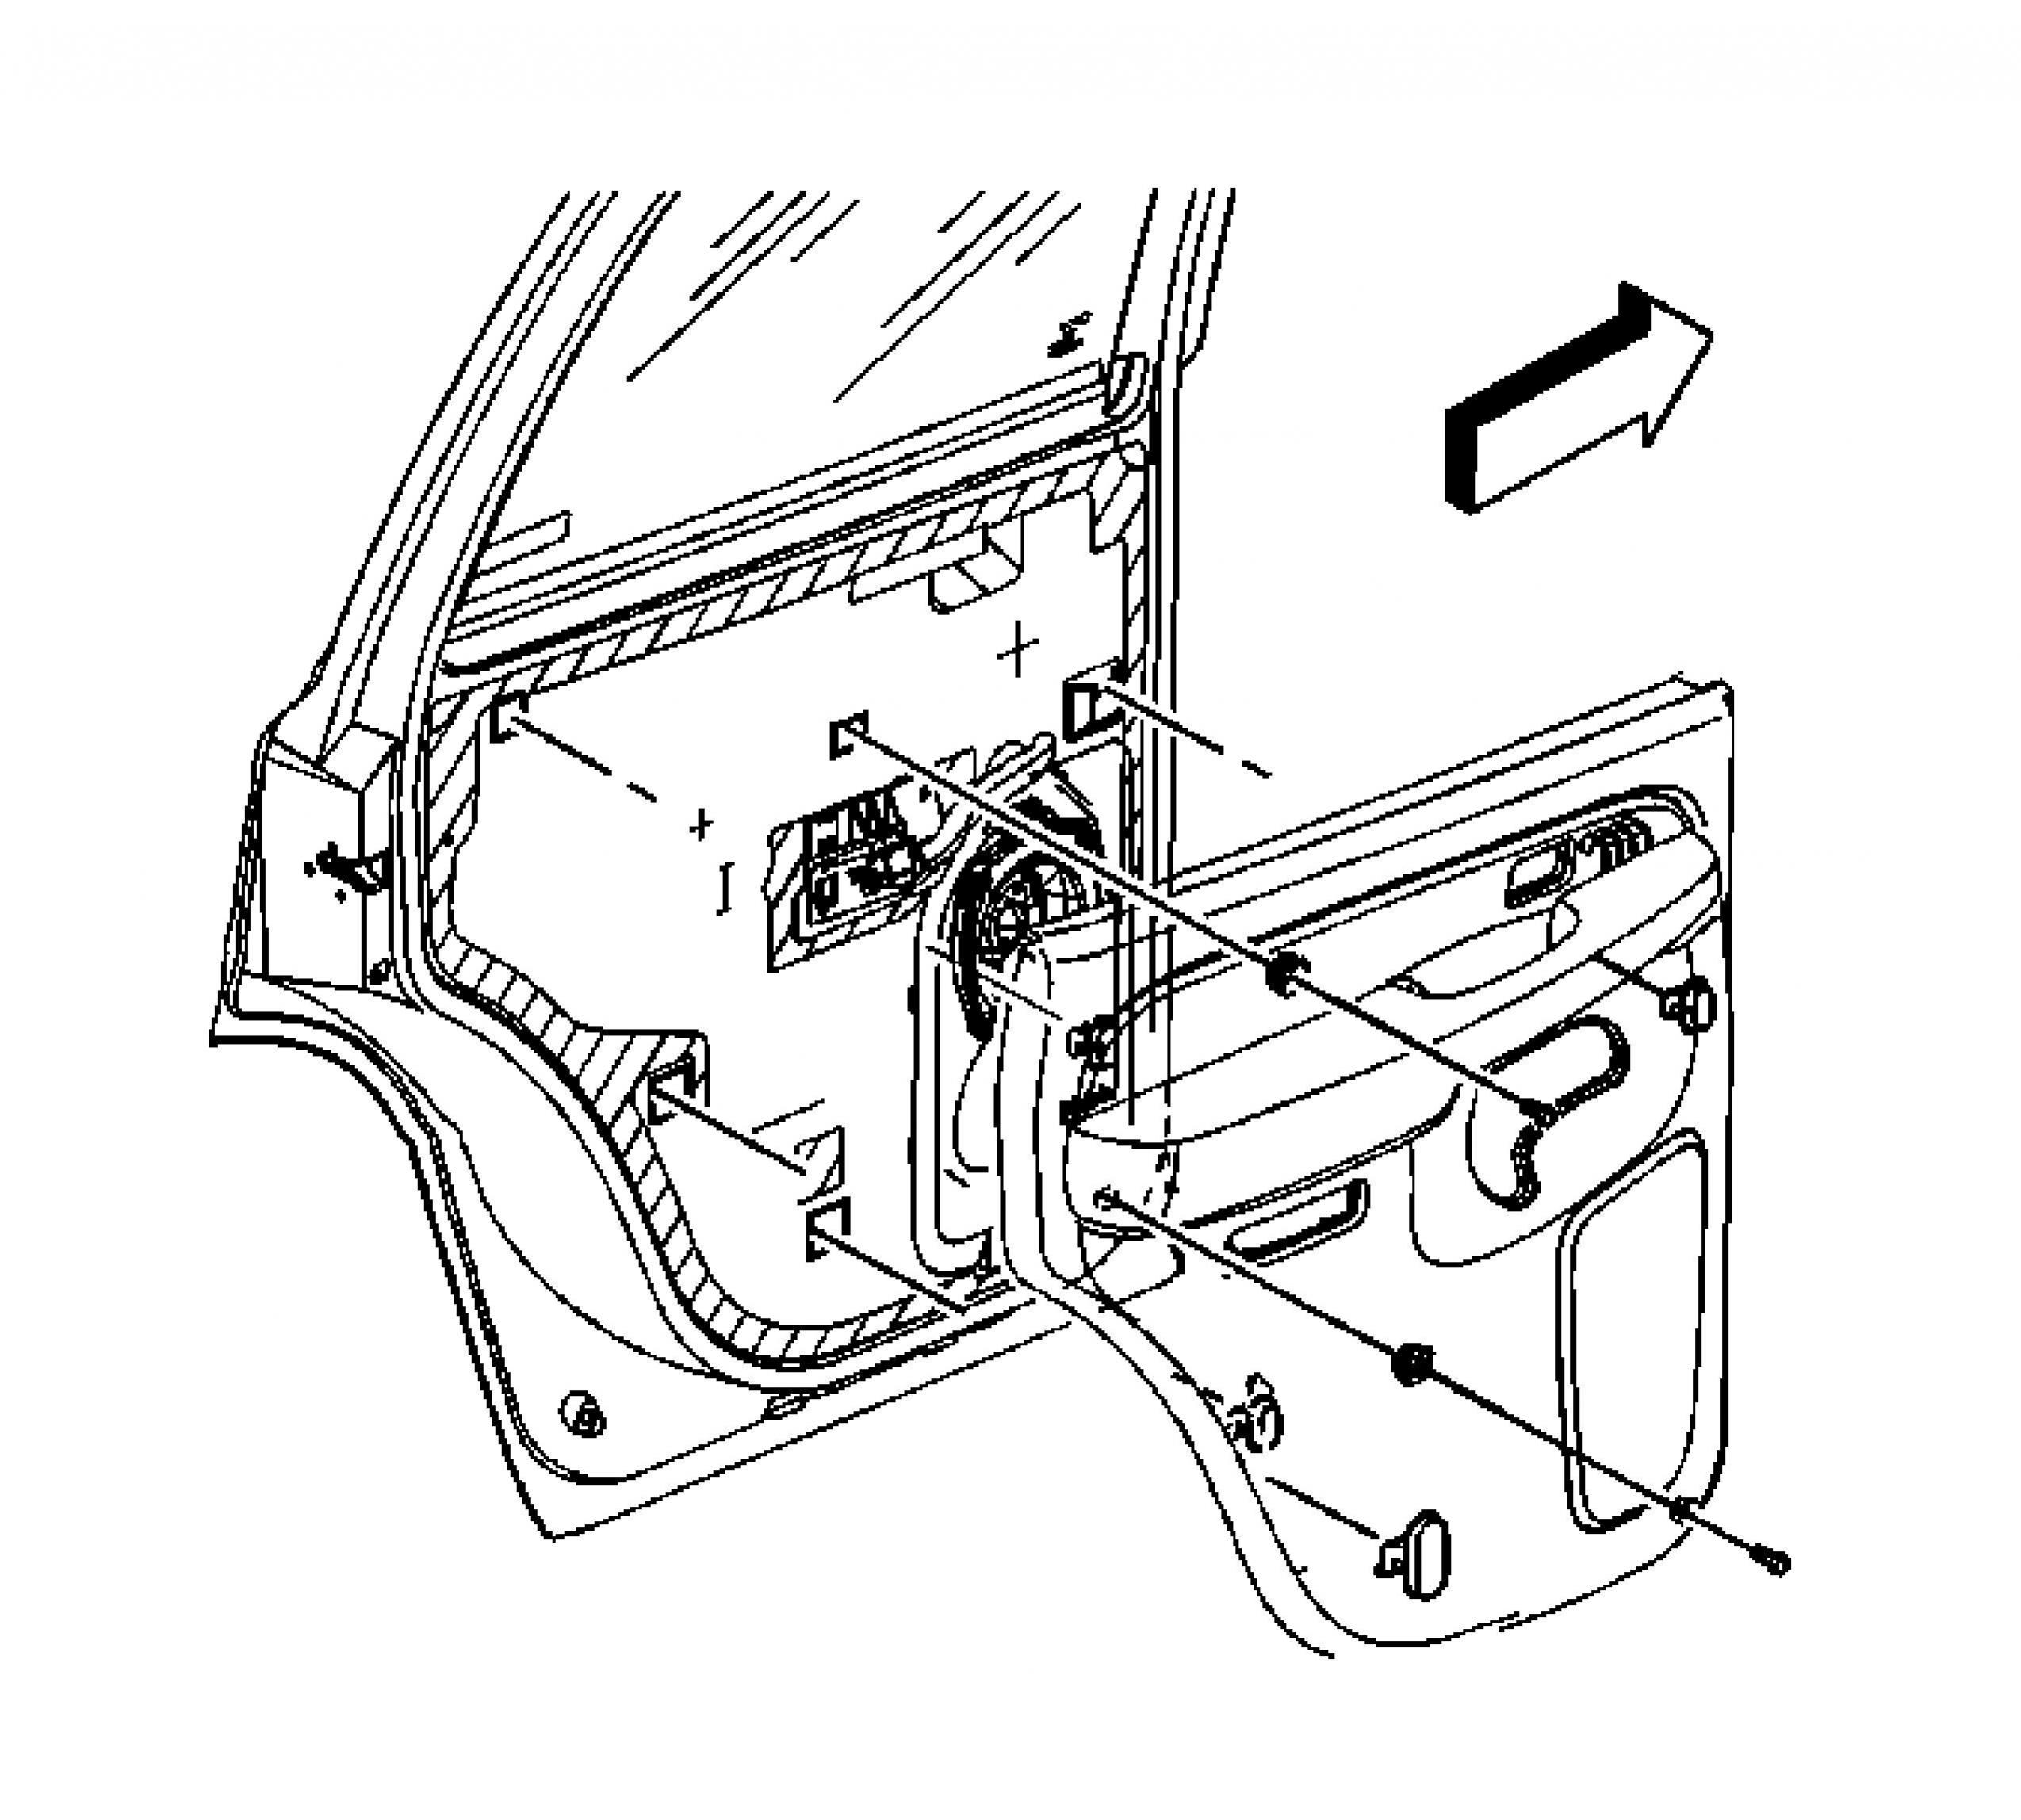 2001 suburban door ledningsdiagram